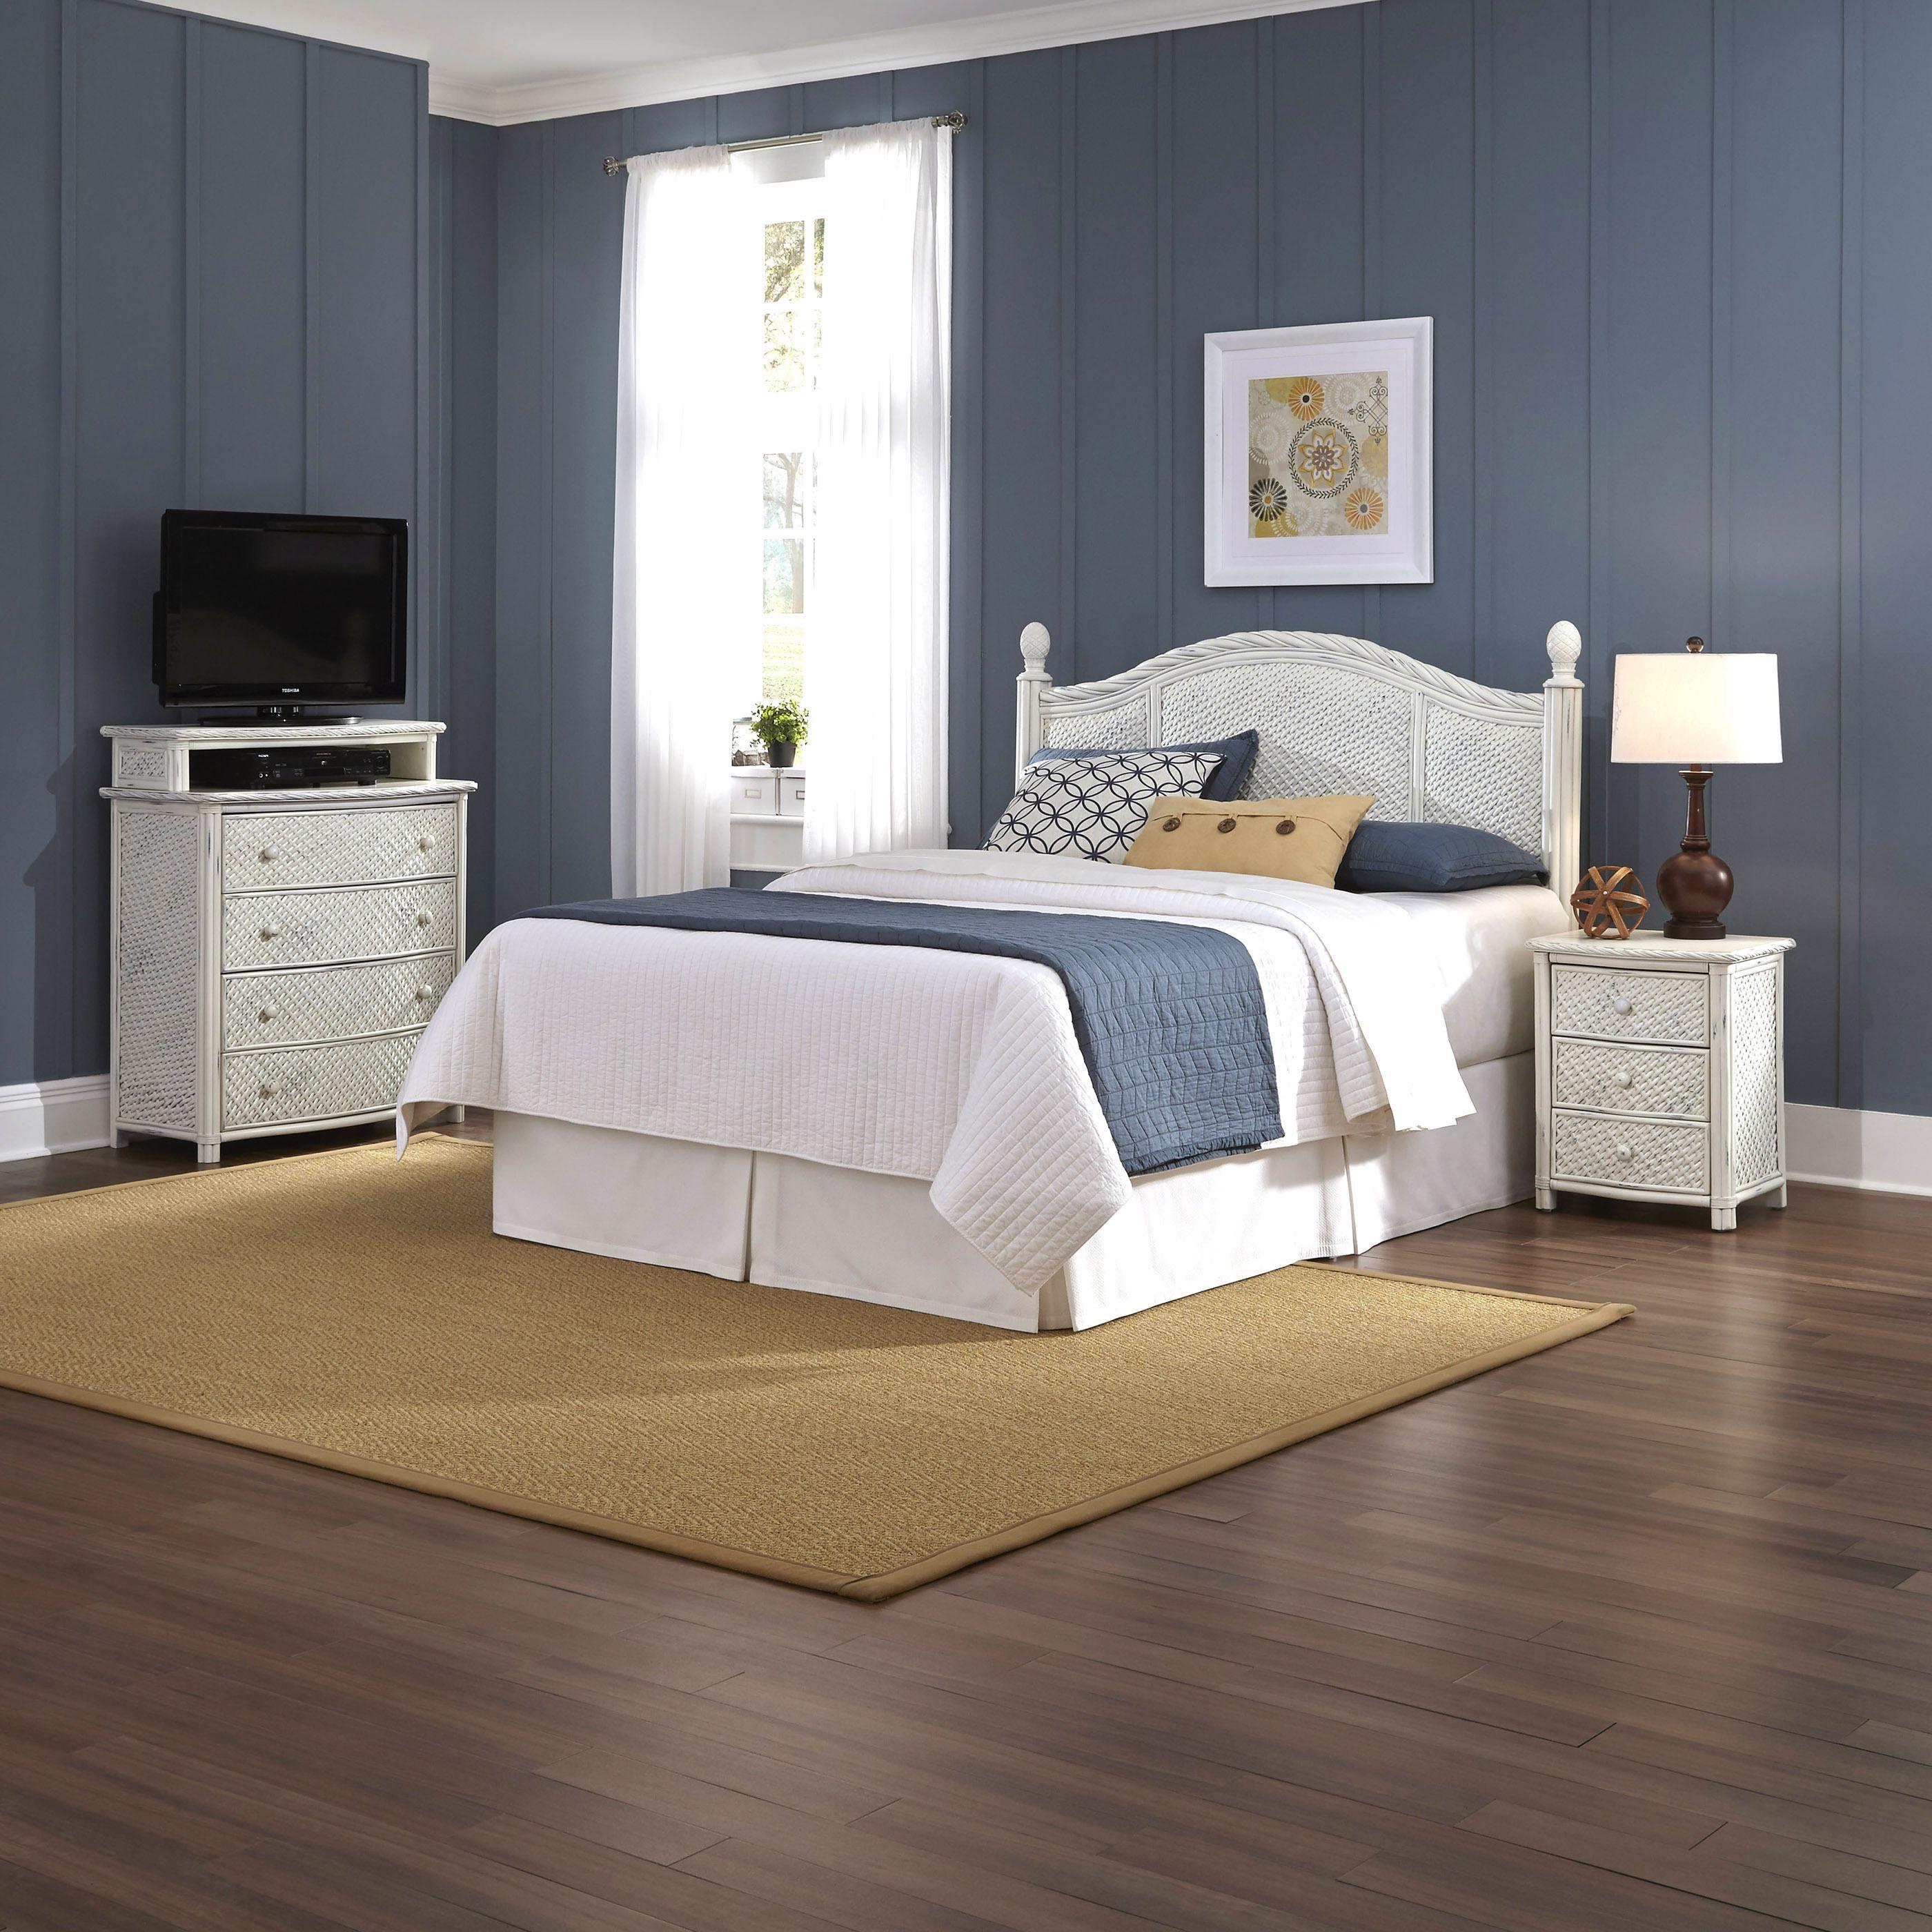 Home styles marco island queen full headboard.